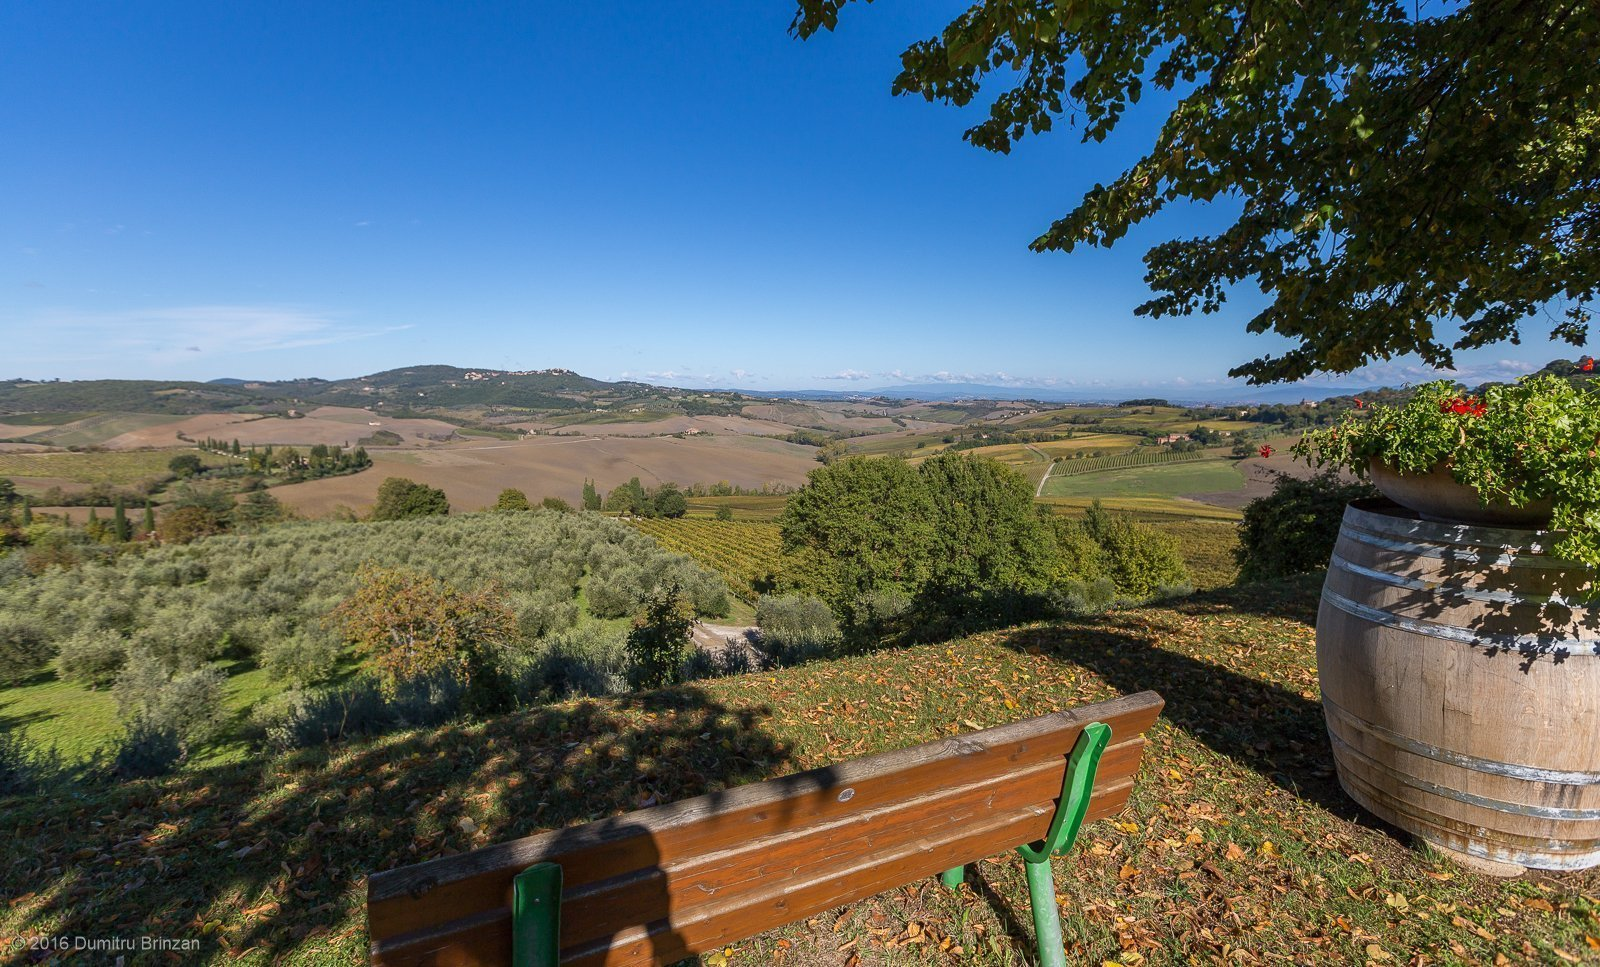 2016-canneto-winery-montepulciano-7